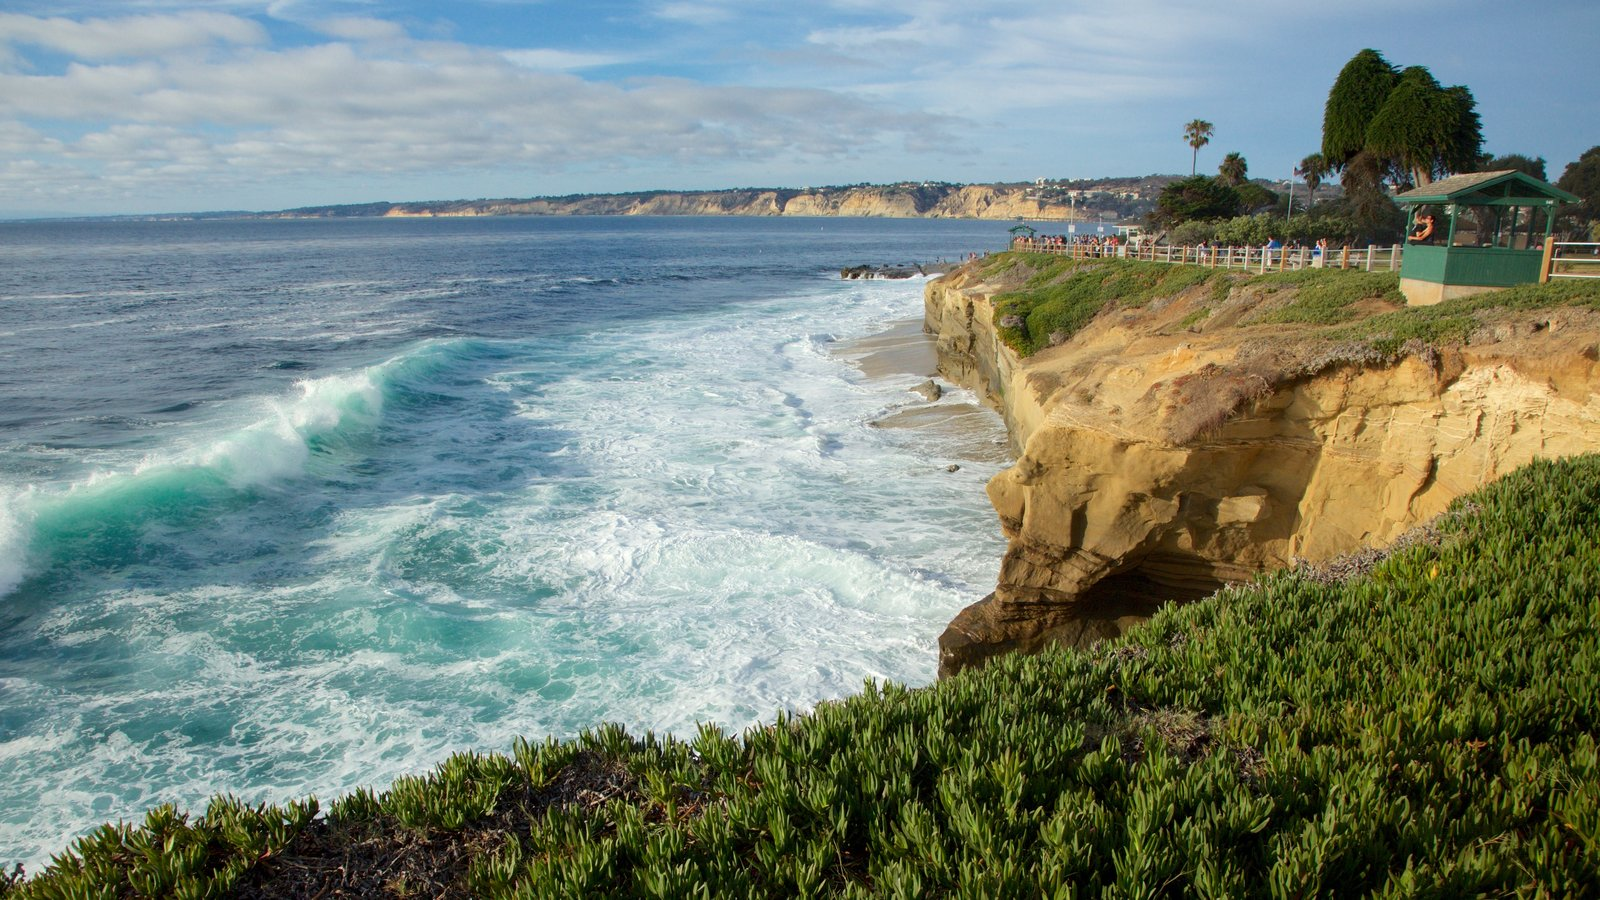 La Jolla caracterizando surfe, litoral acidentado e paisagens litorâneas